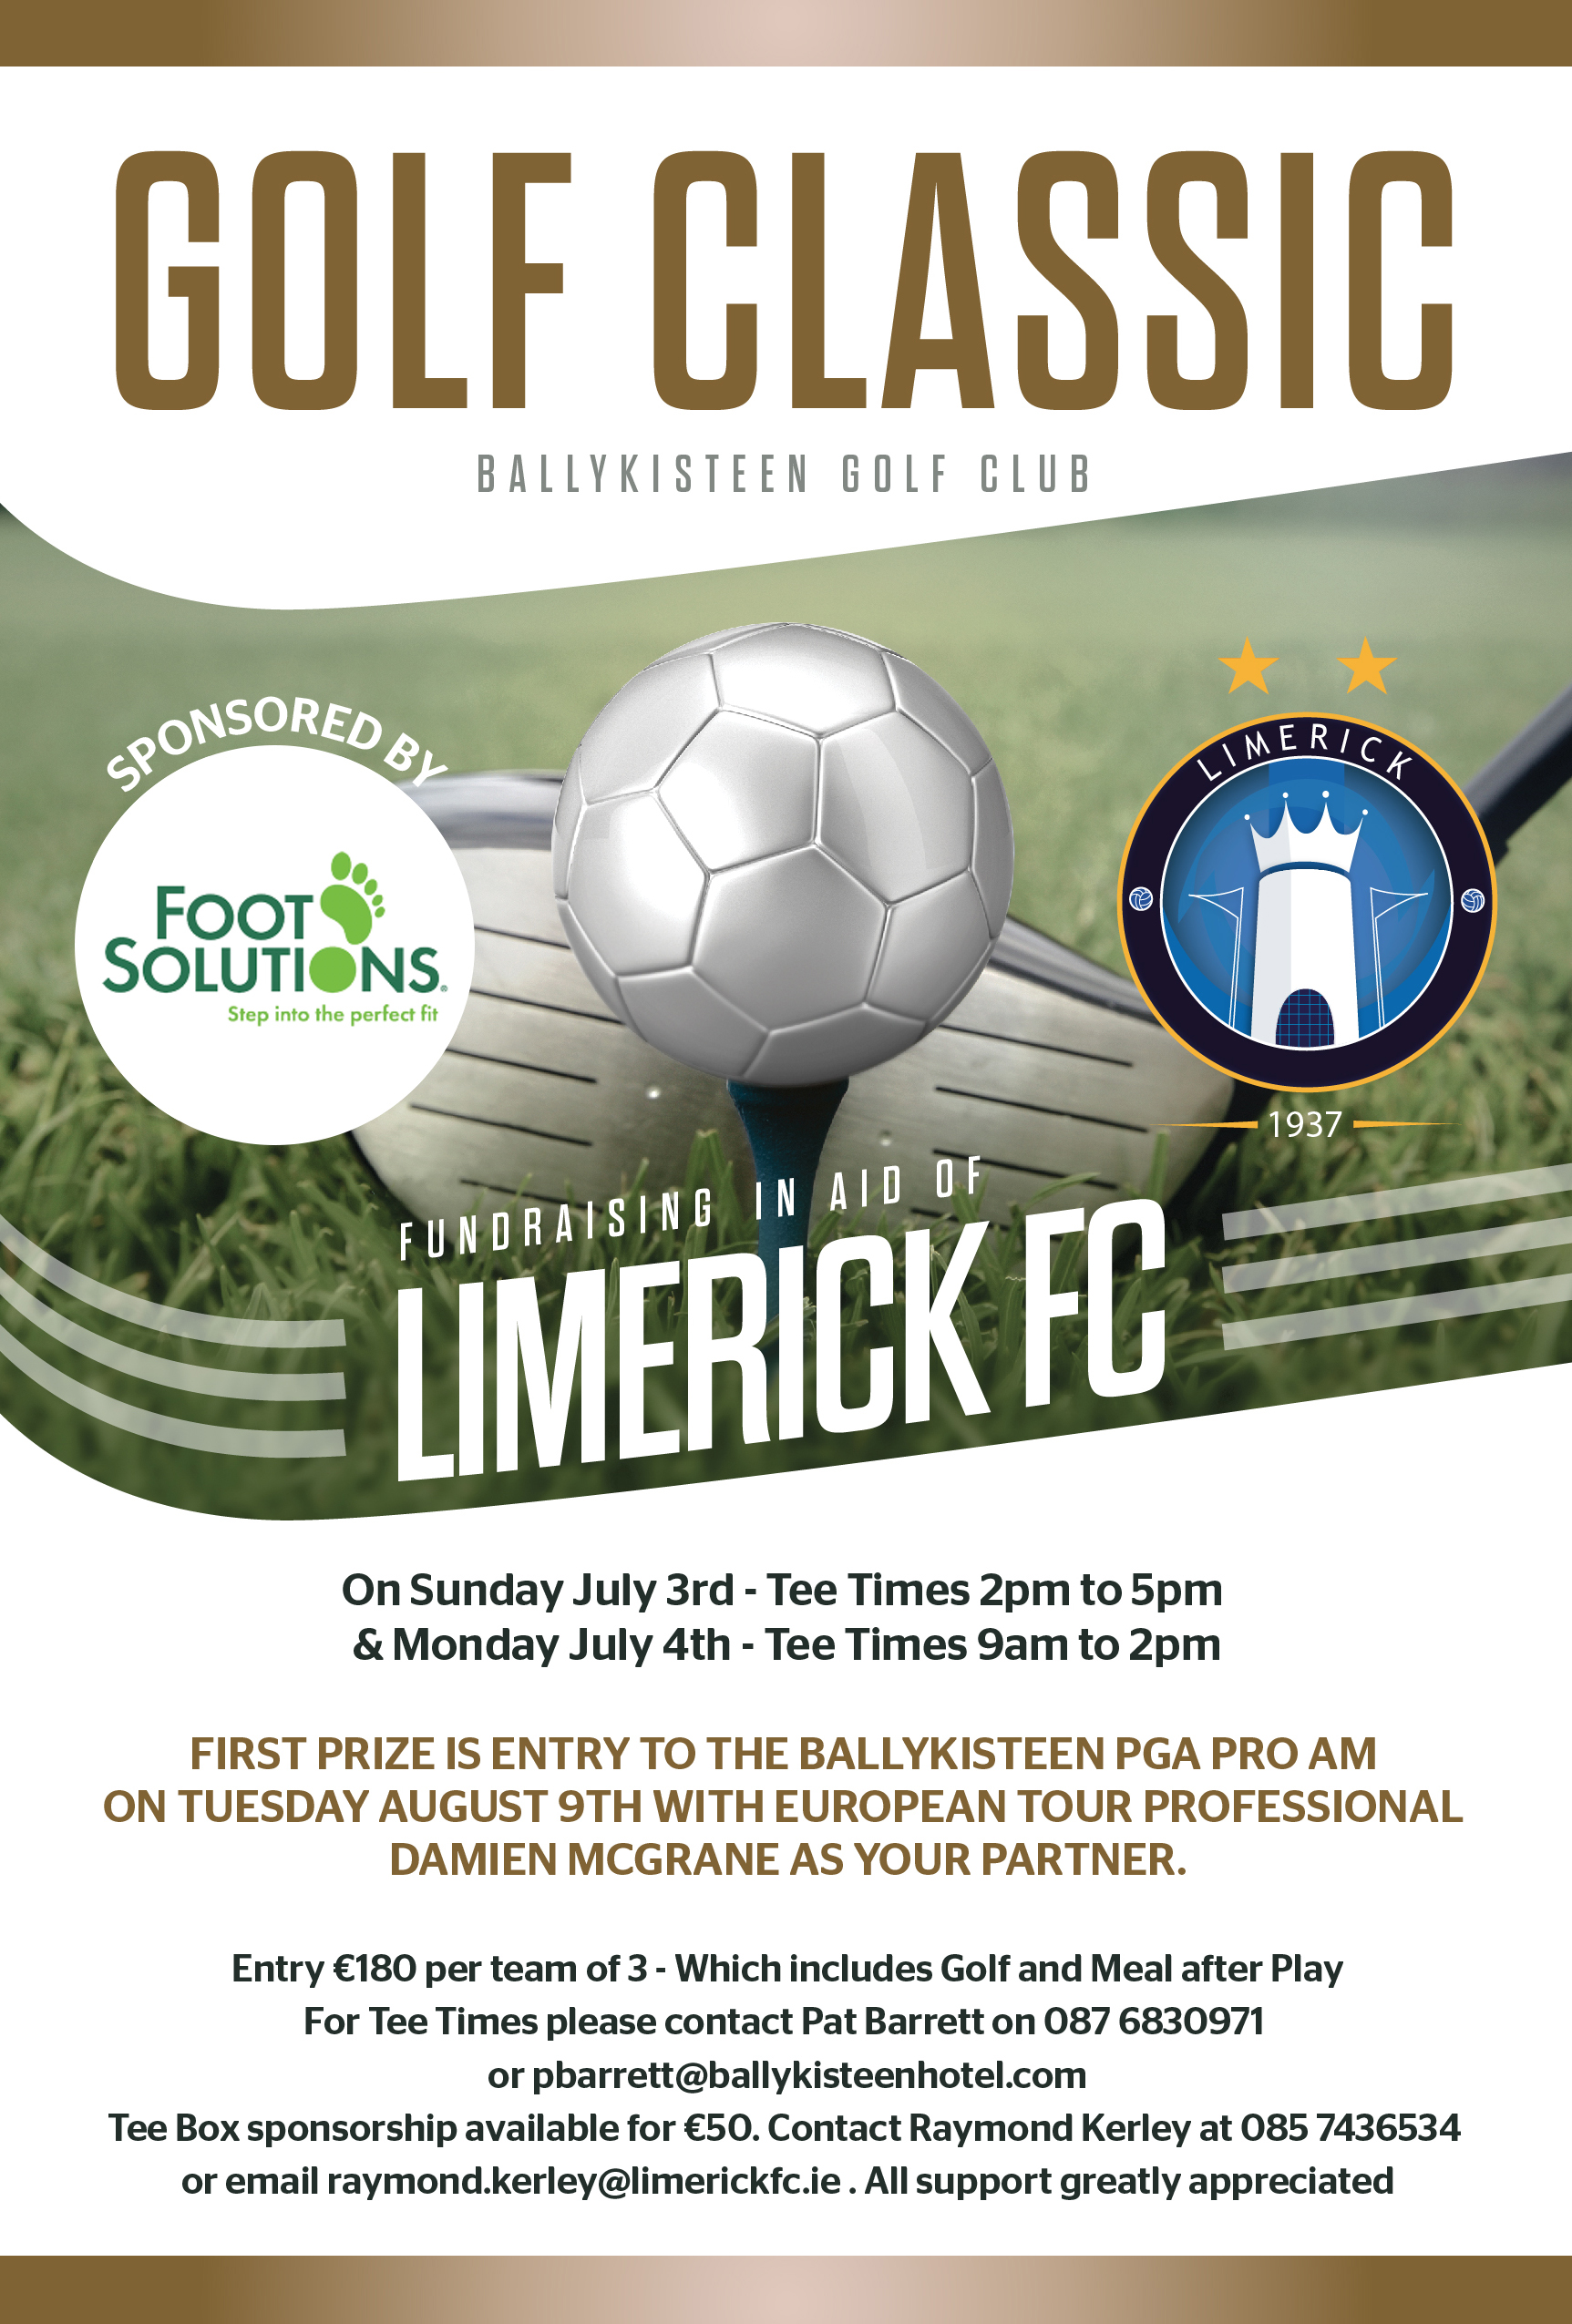 Limerick FC Golf Classic: Ballykisteen Golf Club, 3-4 July